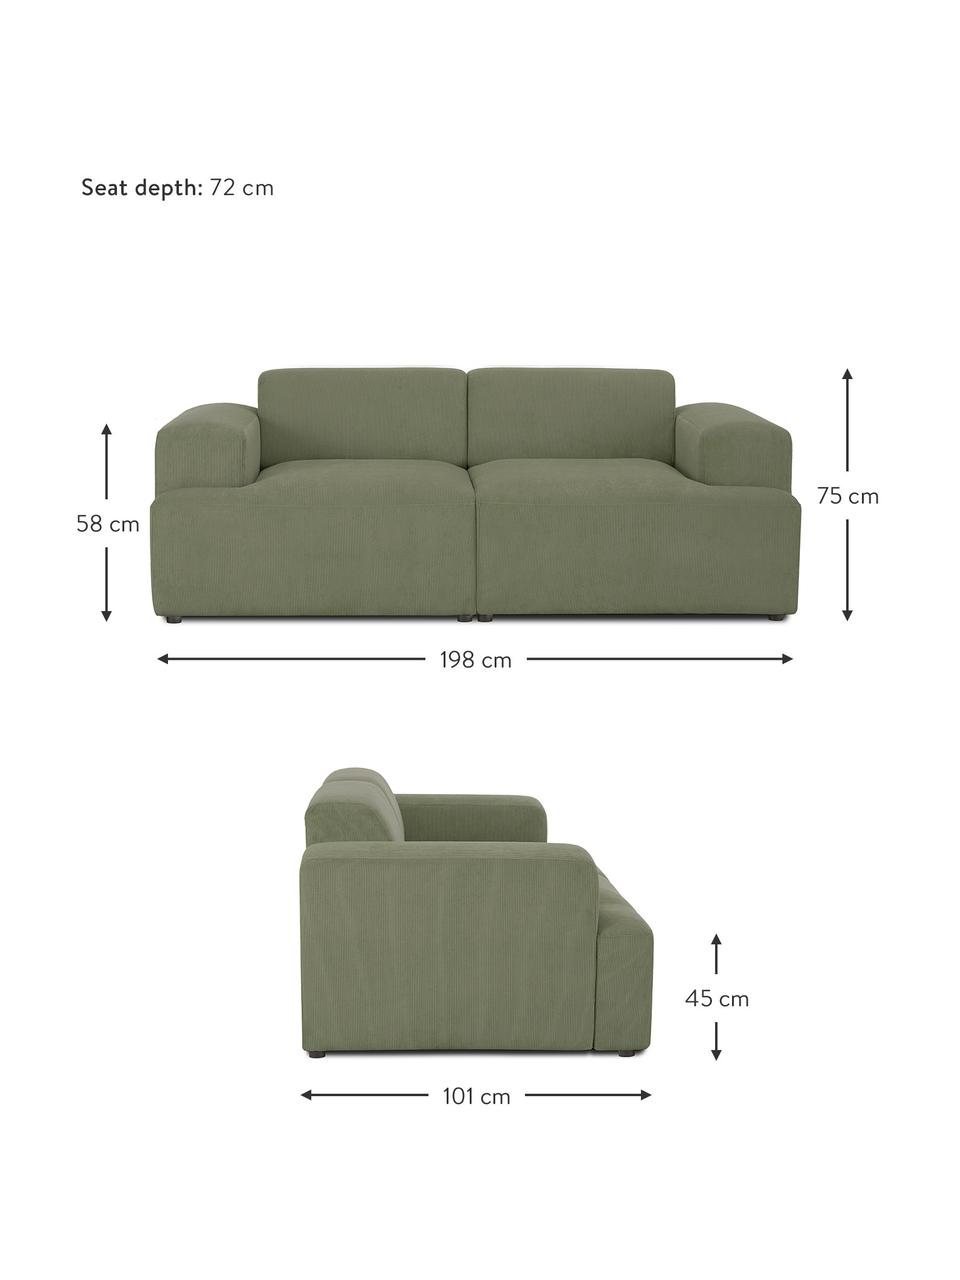 Cord-Sofa Melva (2-Sitzer) in Grün, Bezug: Cord (92% Polyester, 8% P, Gestell: Massives Kiefernholz, FSC, Füße: Kunststoff, Cord Grün, B 198 x T 101 cm